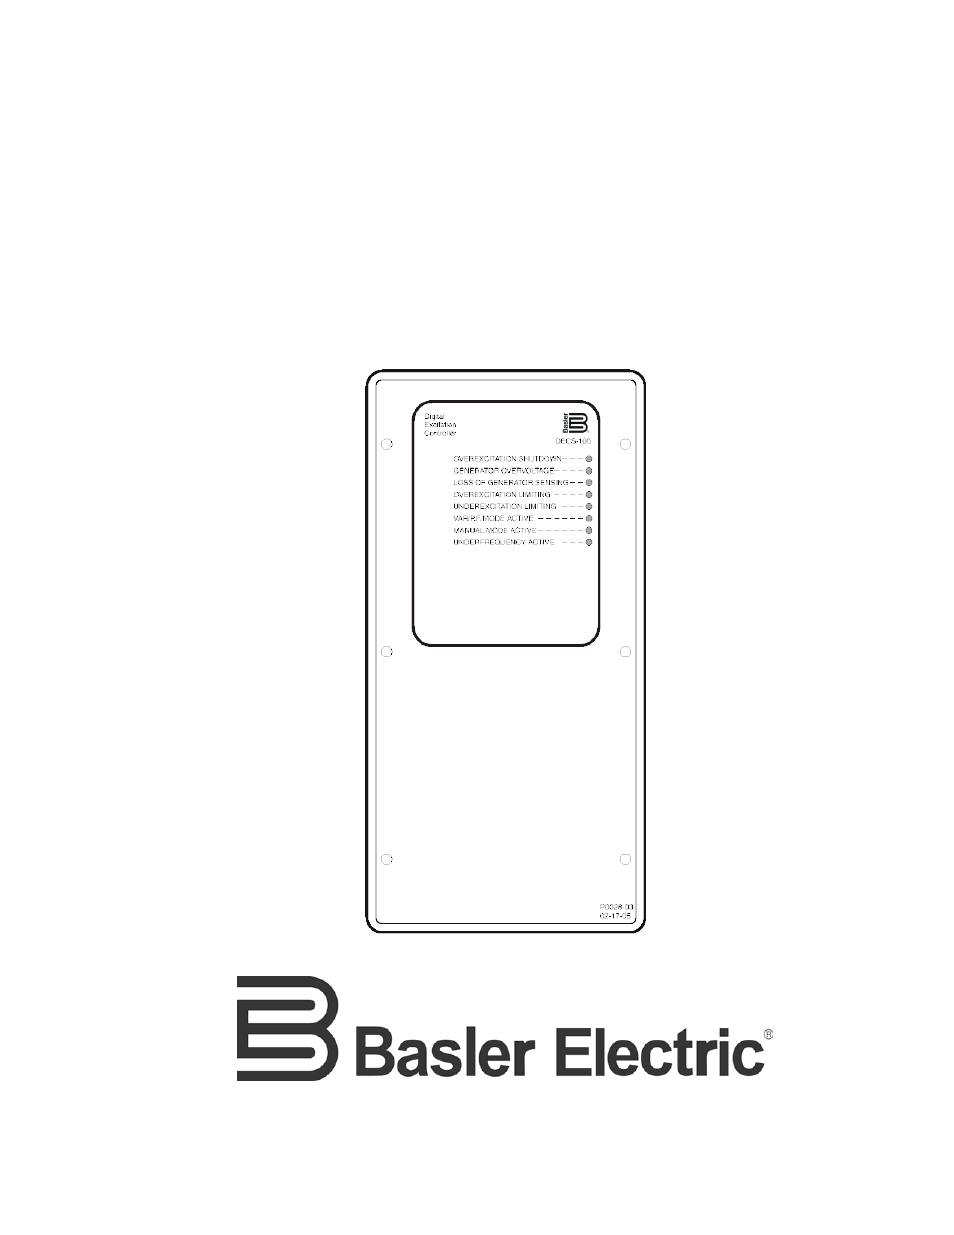 basler generator wiring diagram trusted wiring diagram online